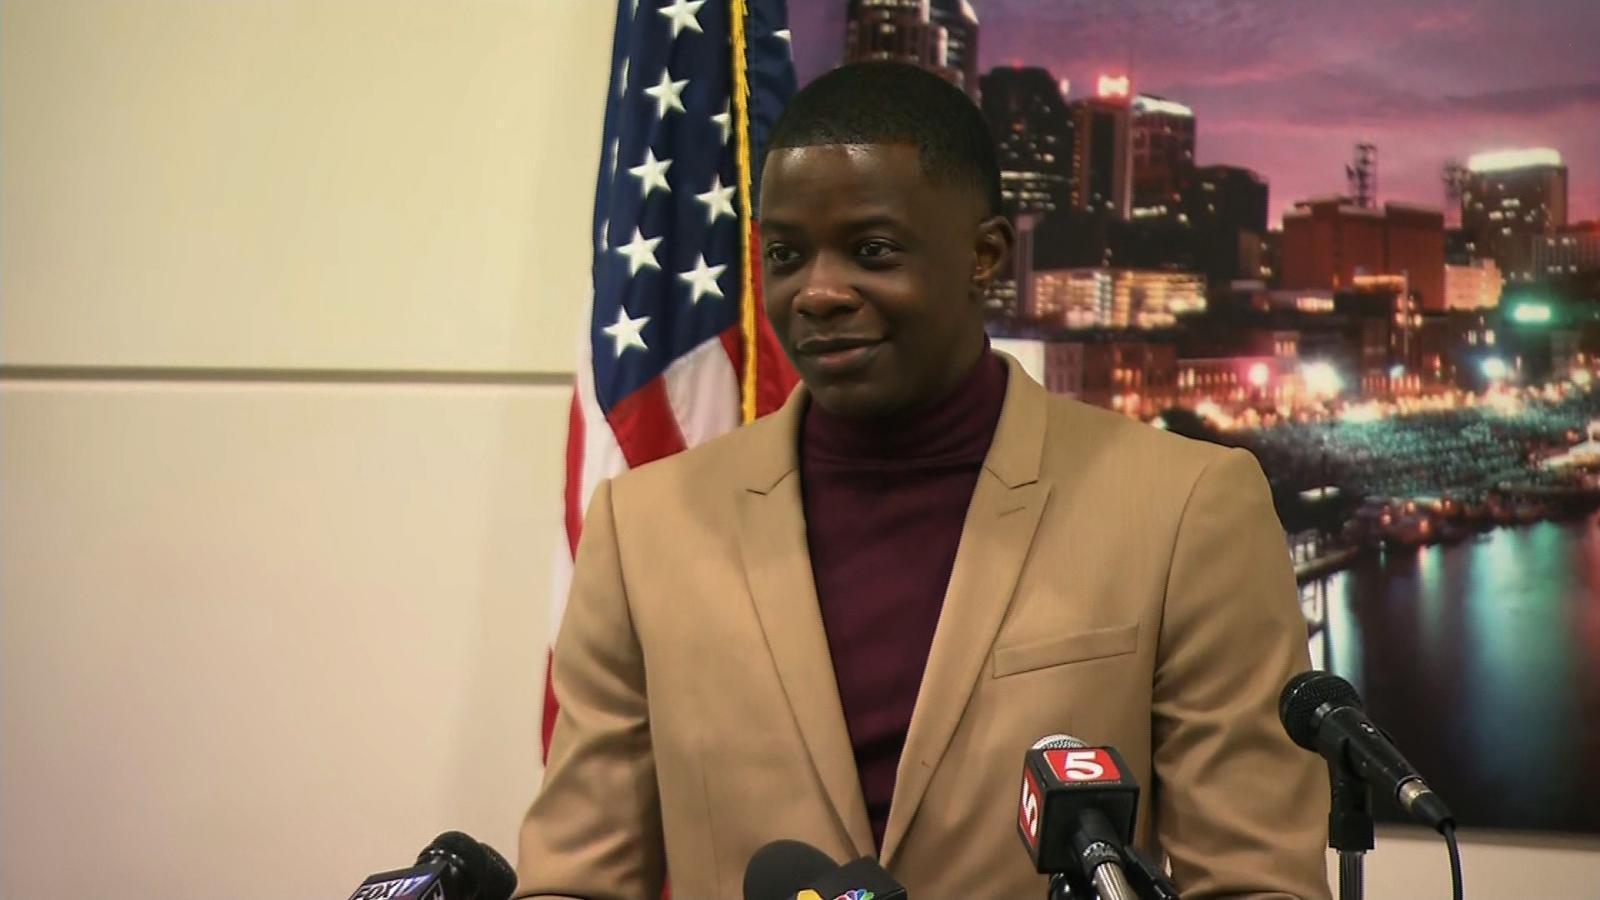 Man who disarmed killer describes chaotic scene